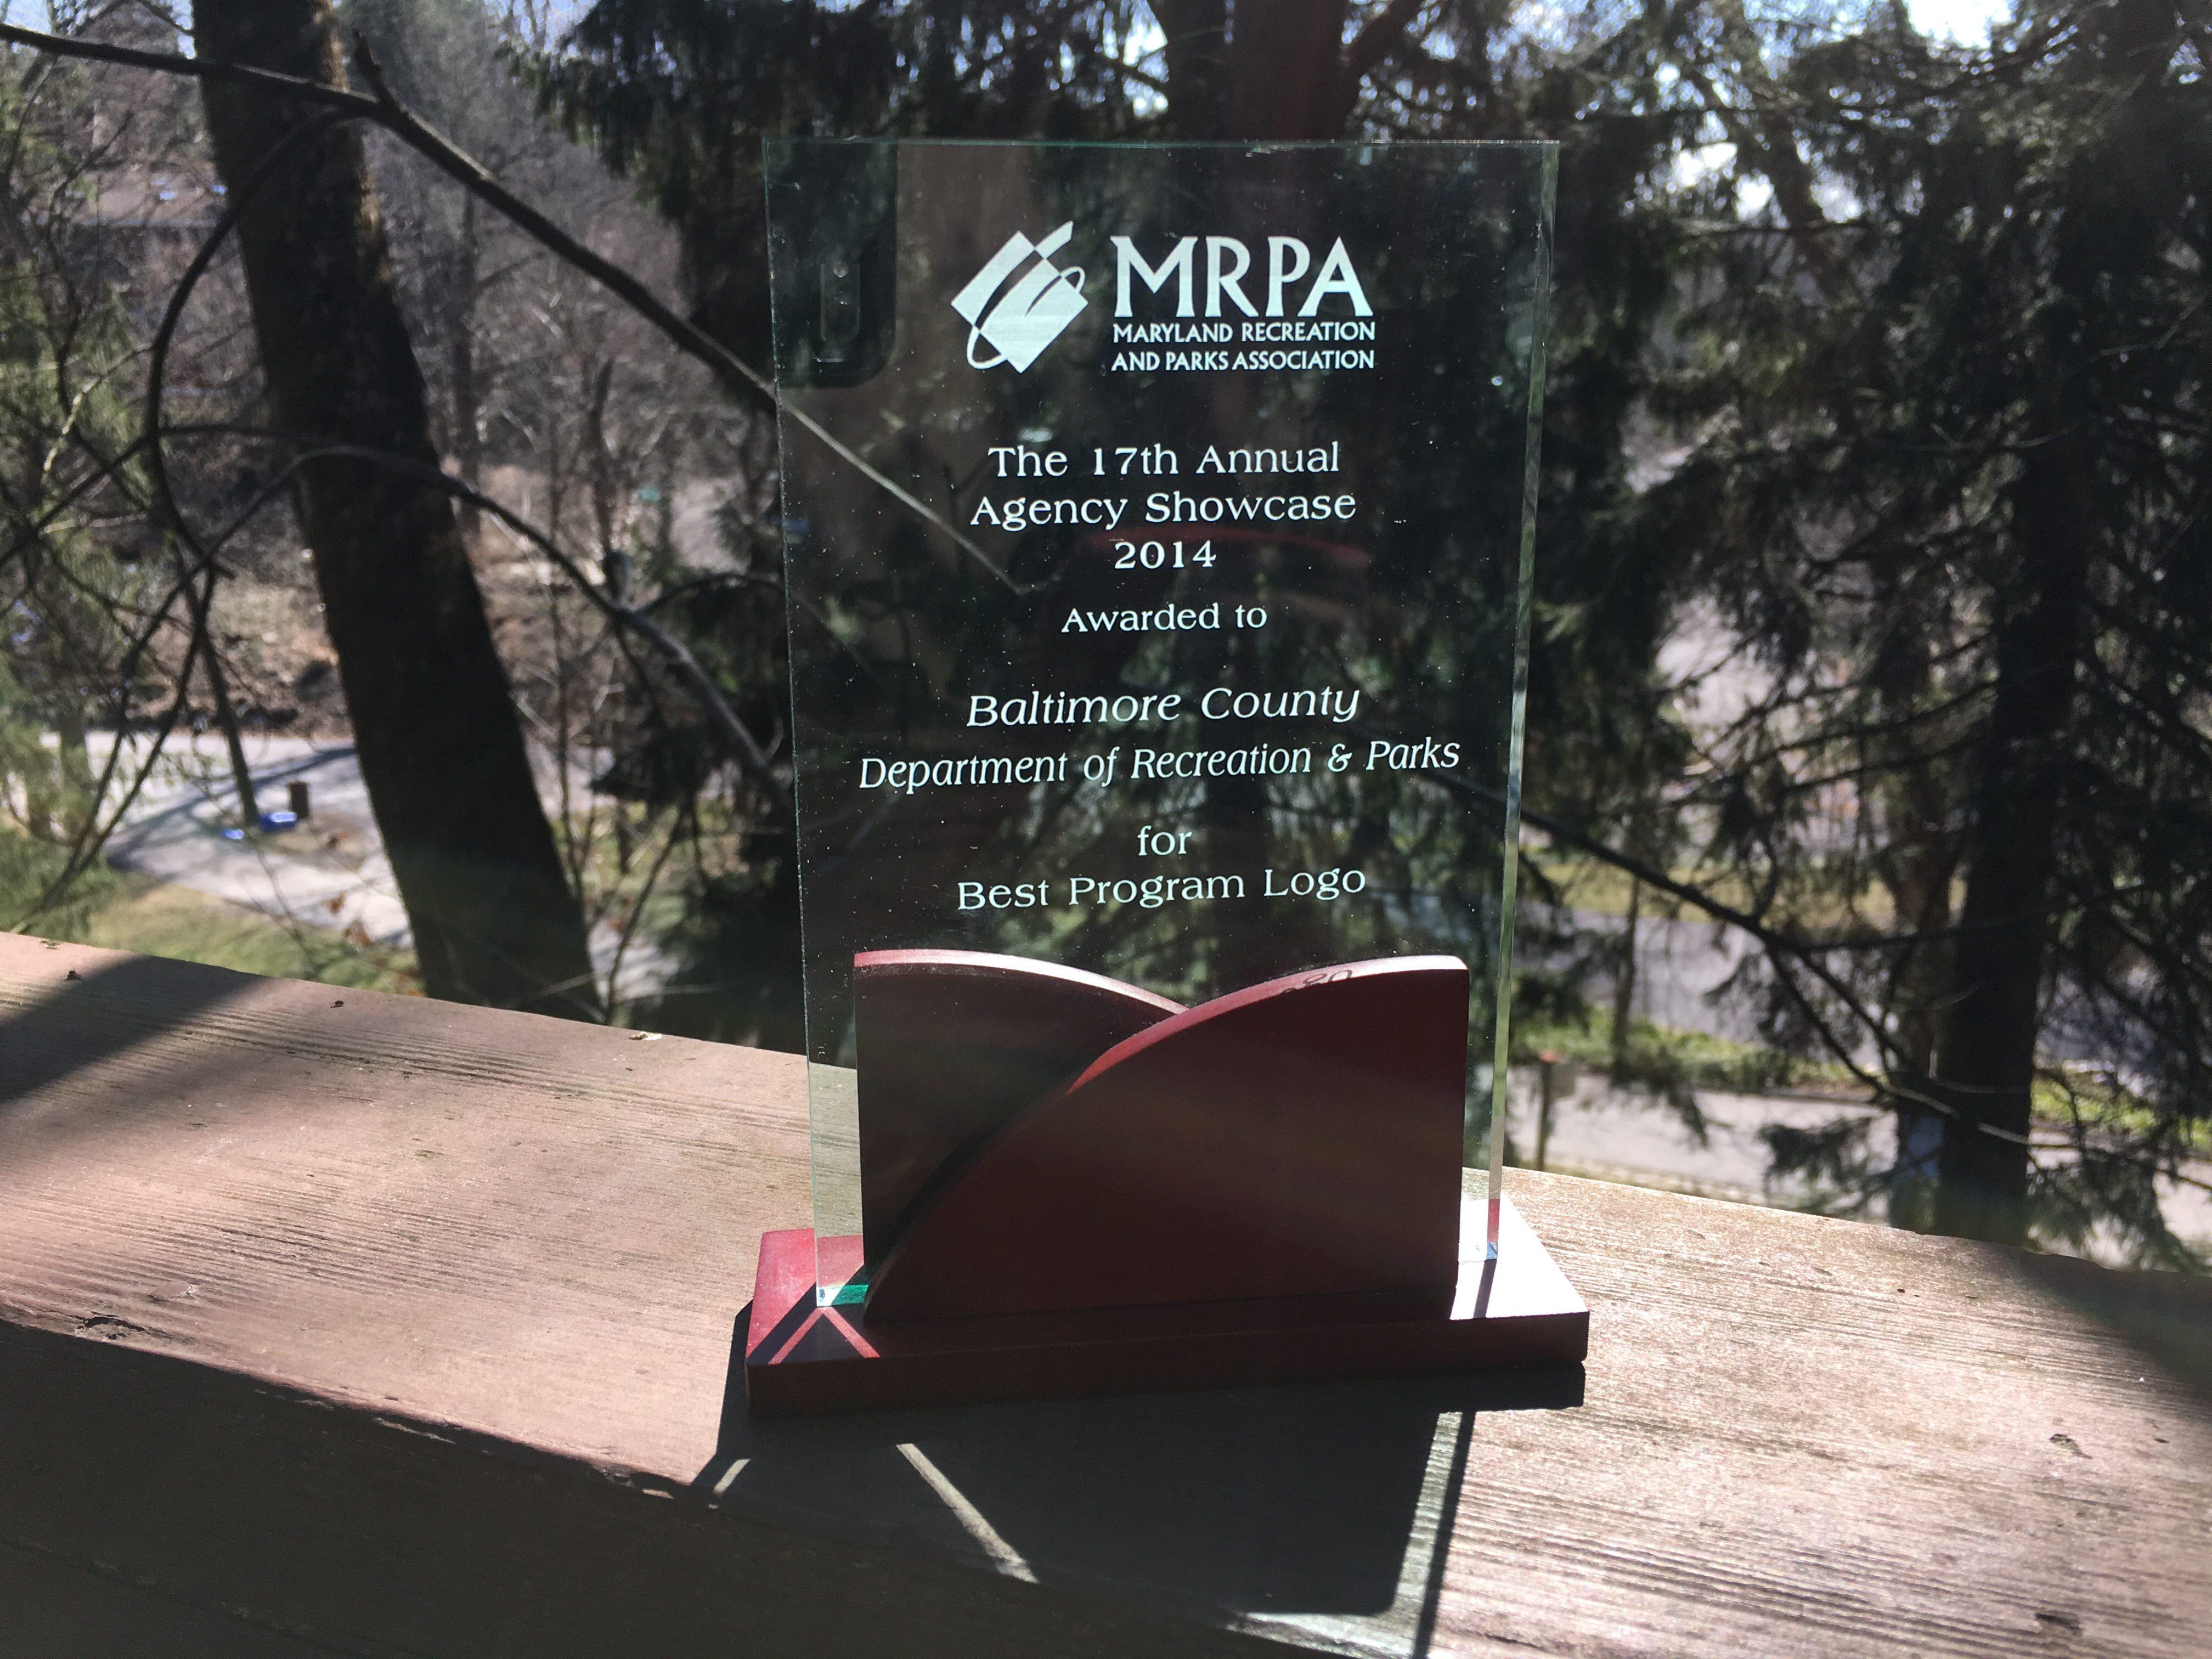 Maryland Recreation and Parks Association award for Best Program Logo 2014